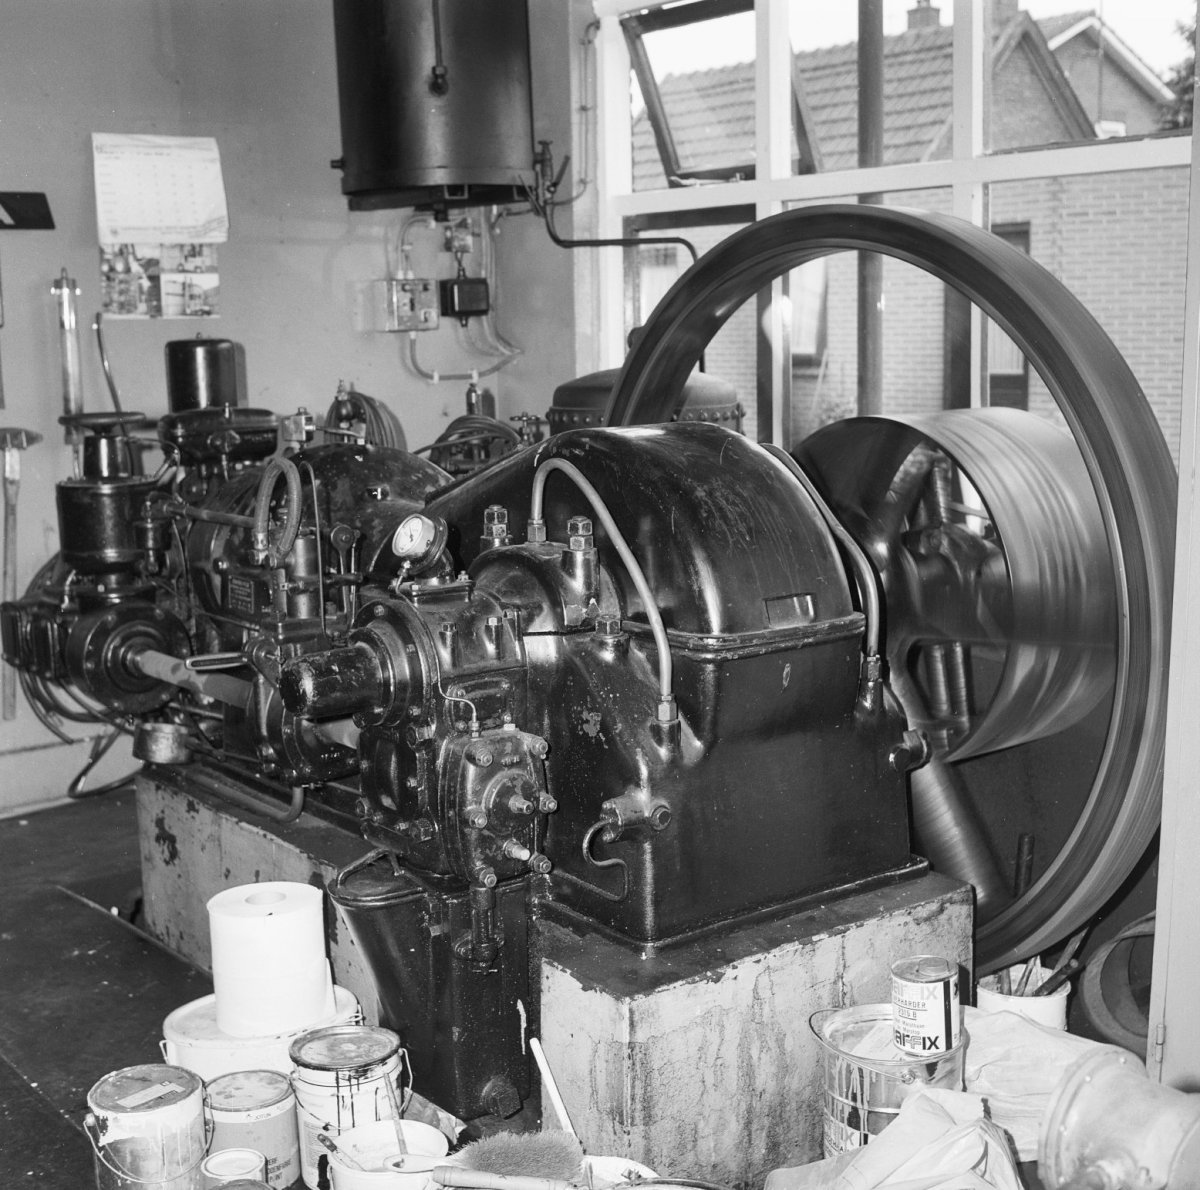 File interieur dieselmotor thomassen nieuw heeten for Interieur 605